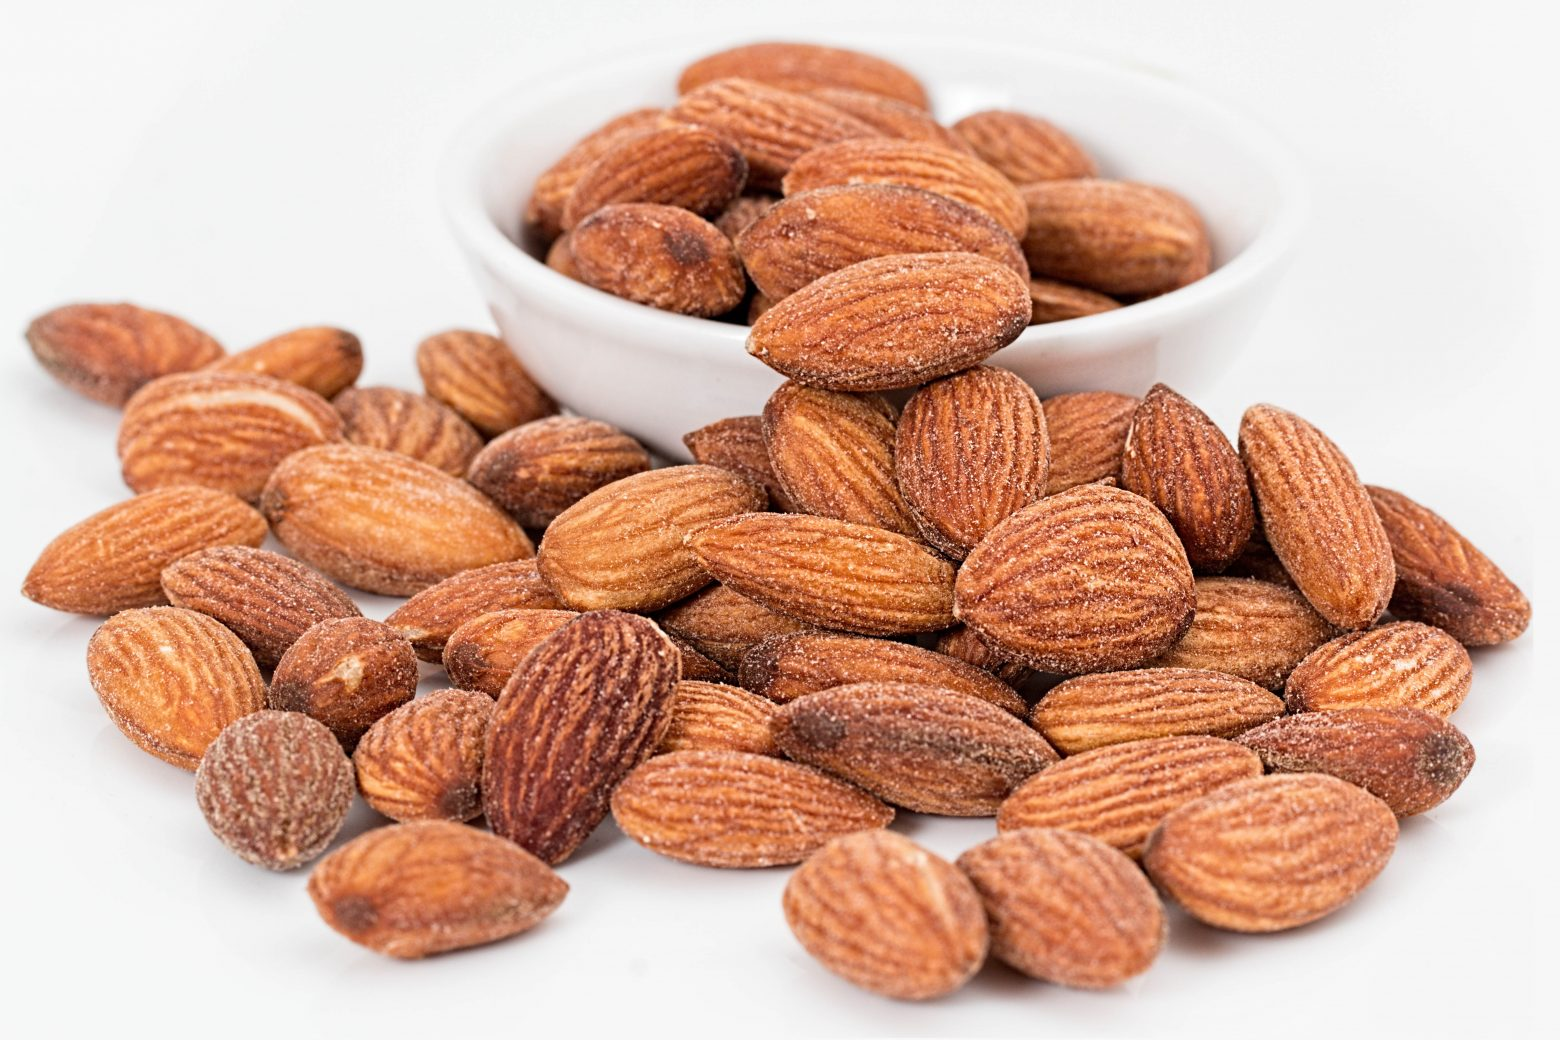 almonds-1768792